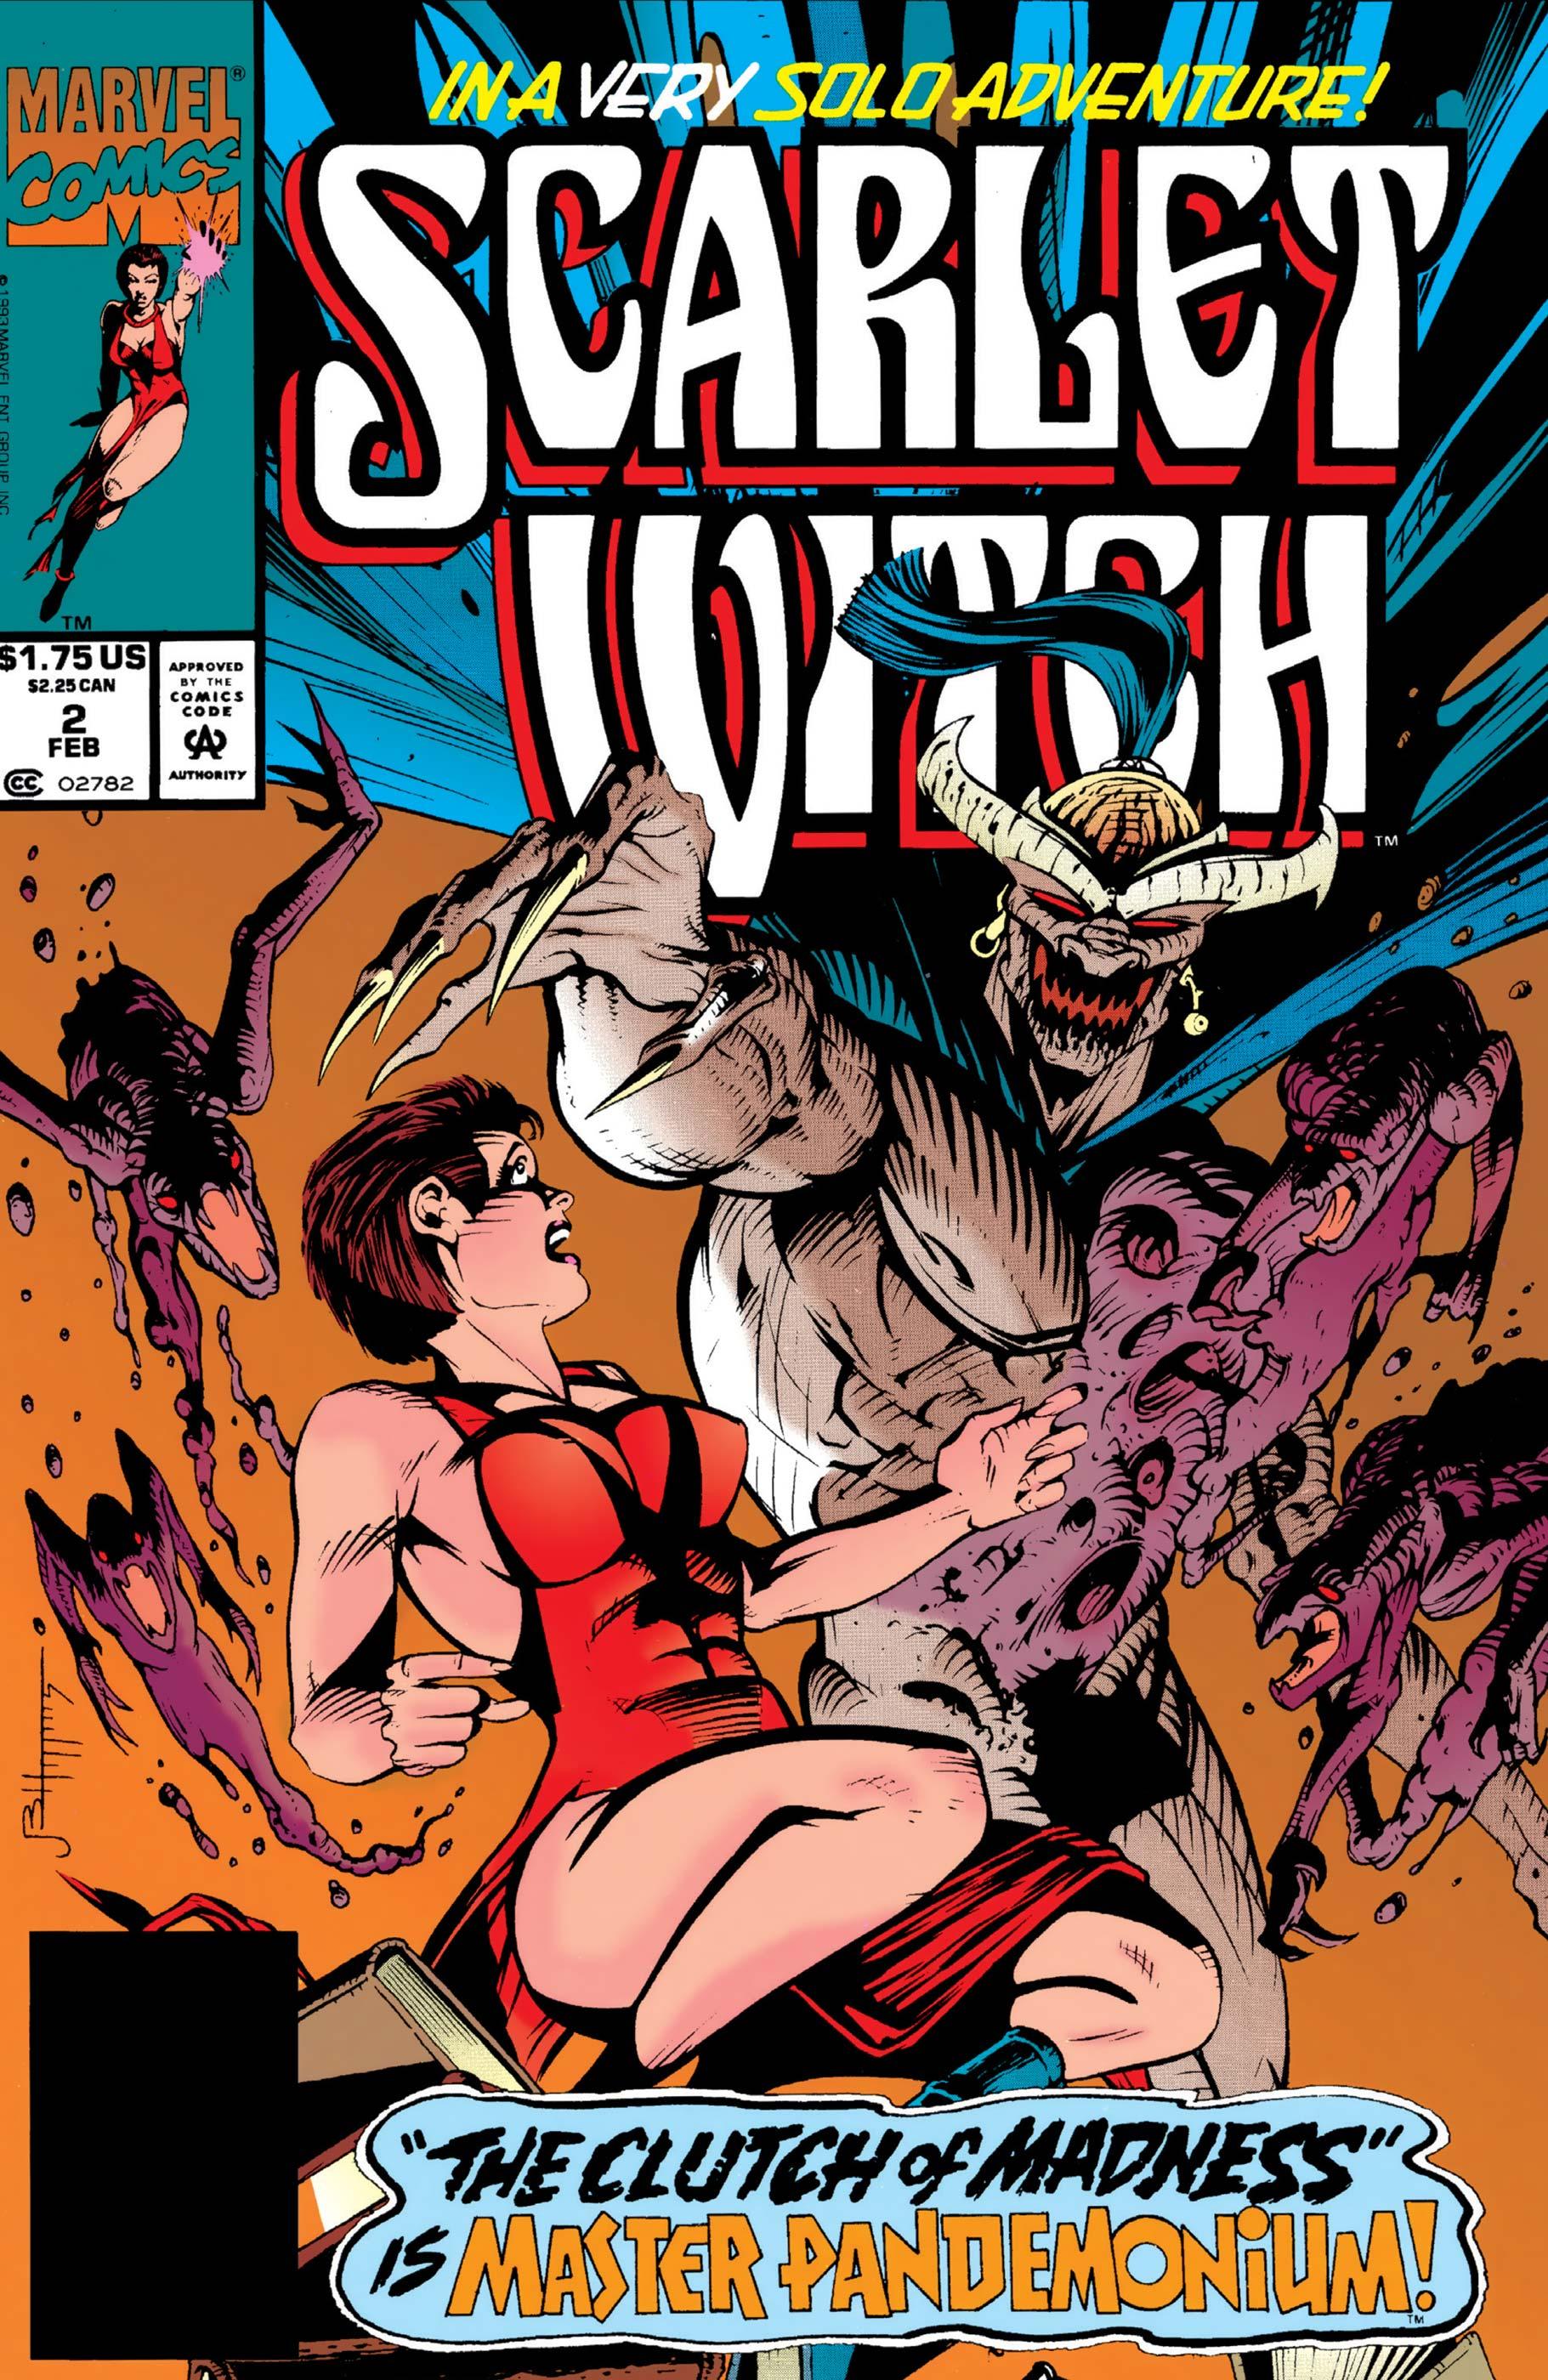 Scarlet Witch (1994) #2